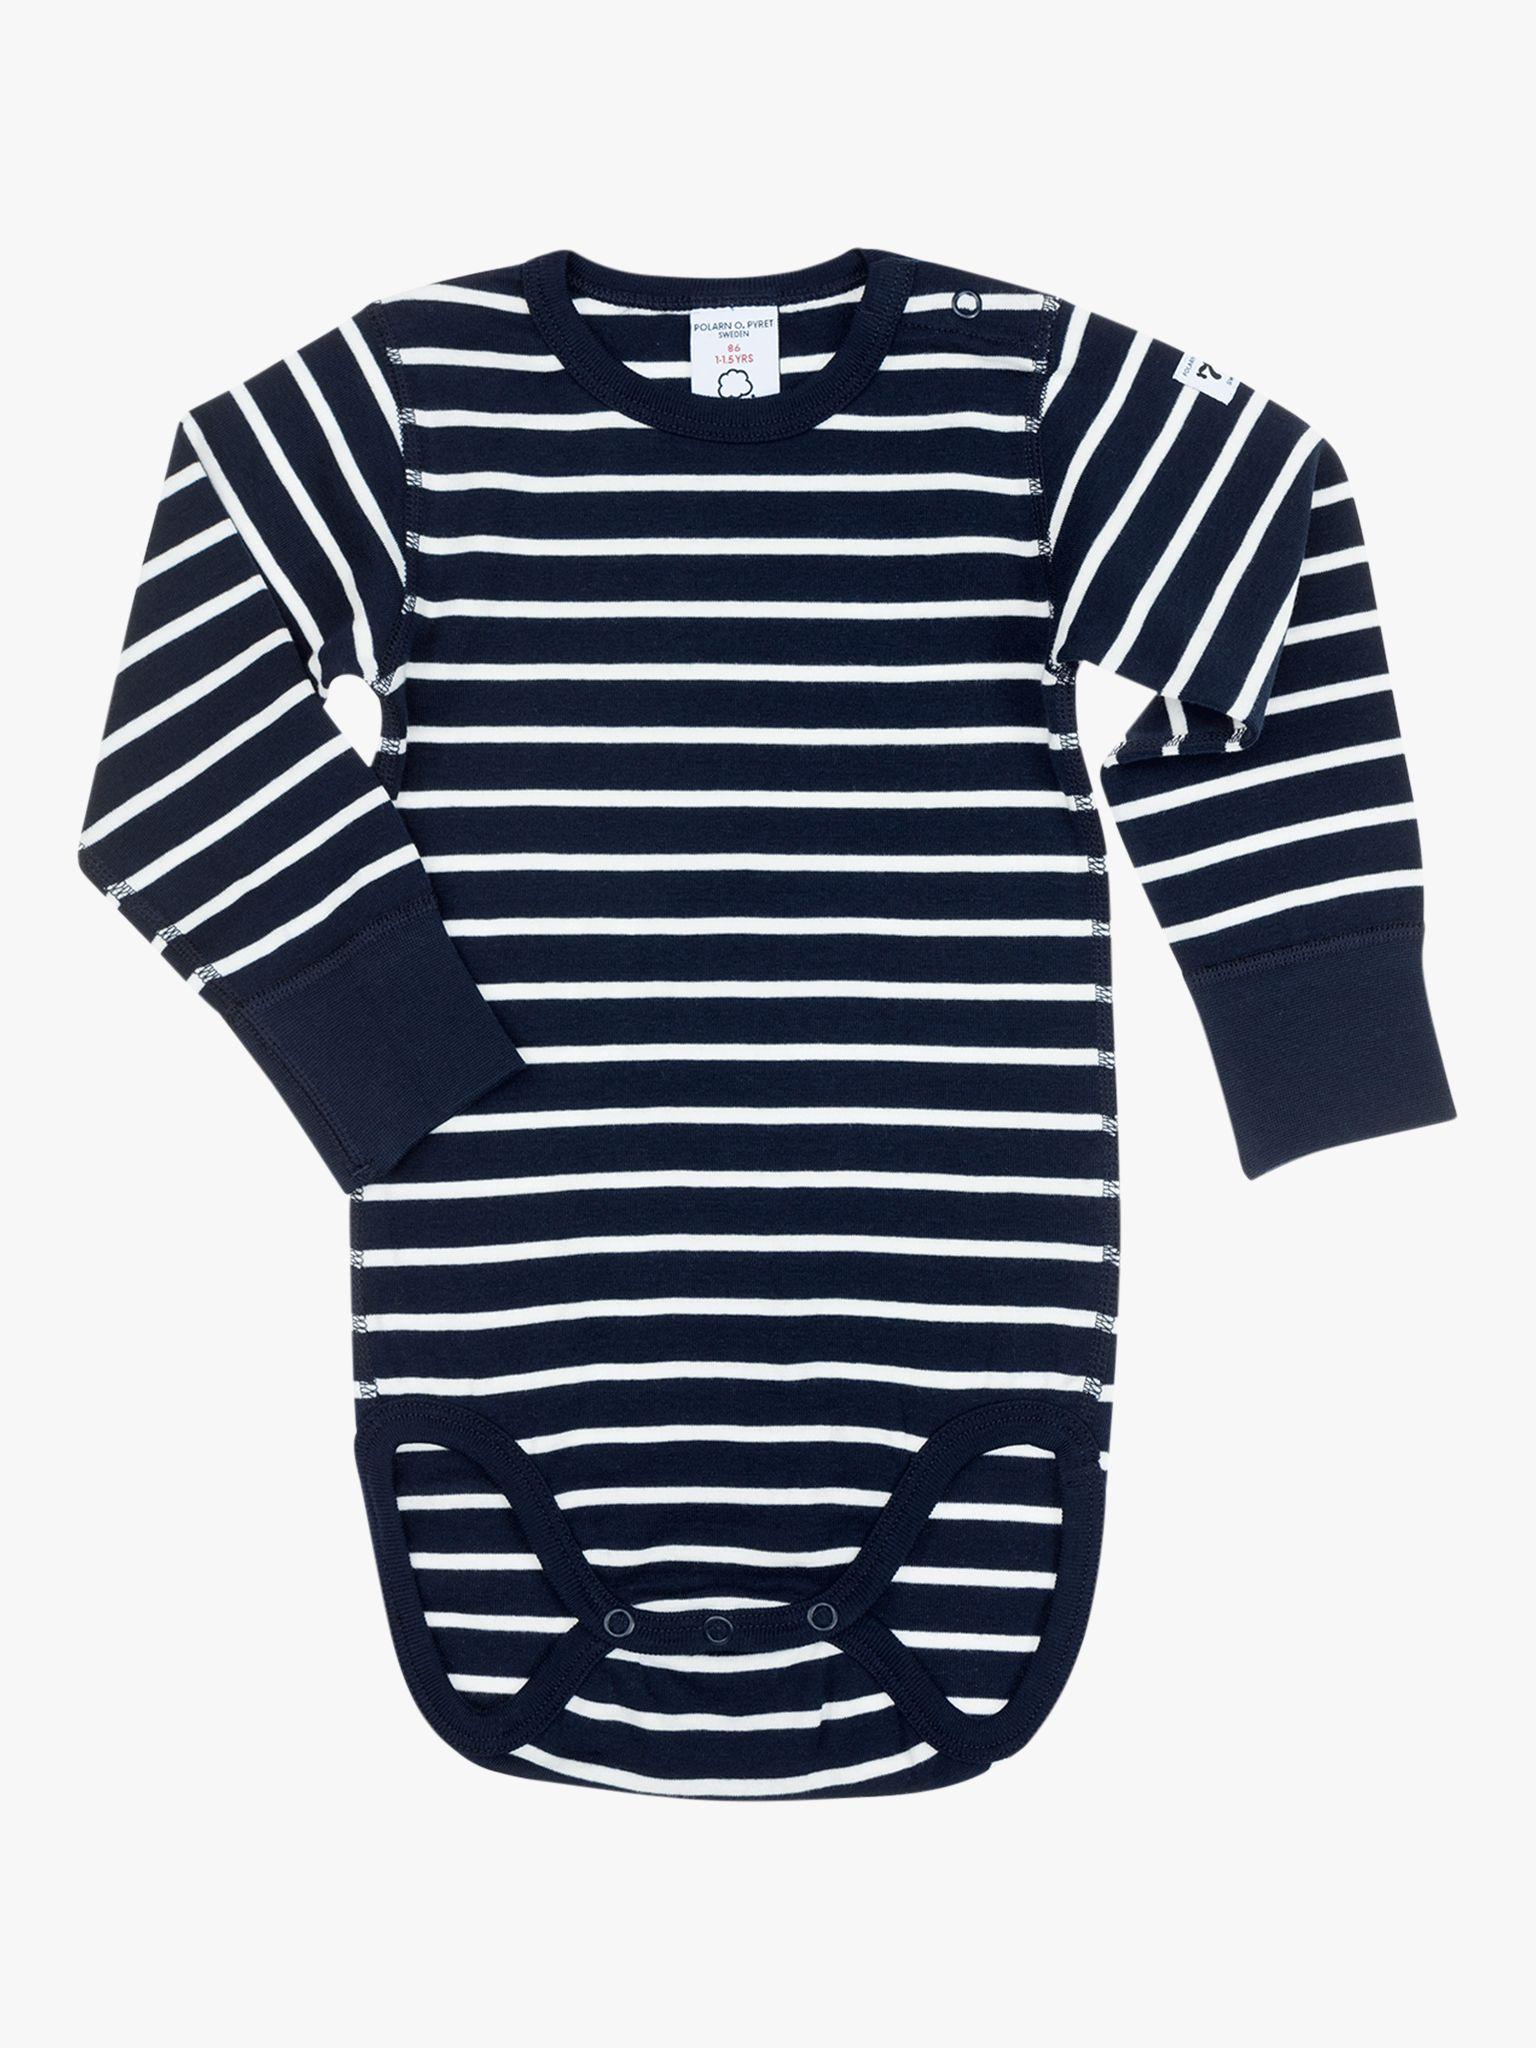 Polarn O. Pyret Polarn O. Pyret Baby GOTS Organic Cotton Stripe Long Sleeve Bodysuit, Blue